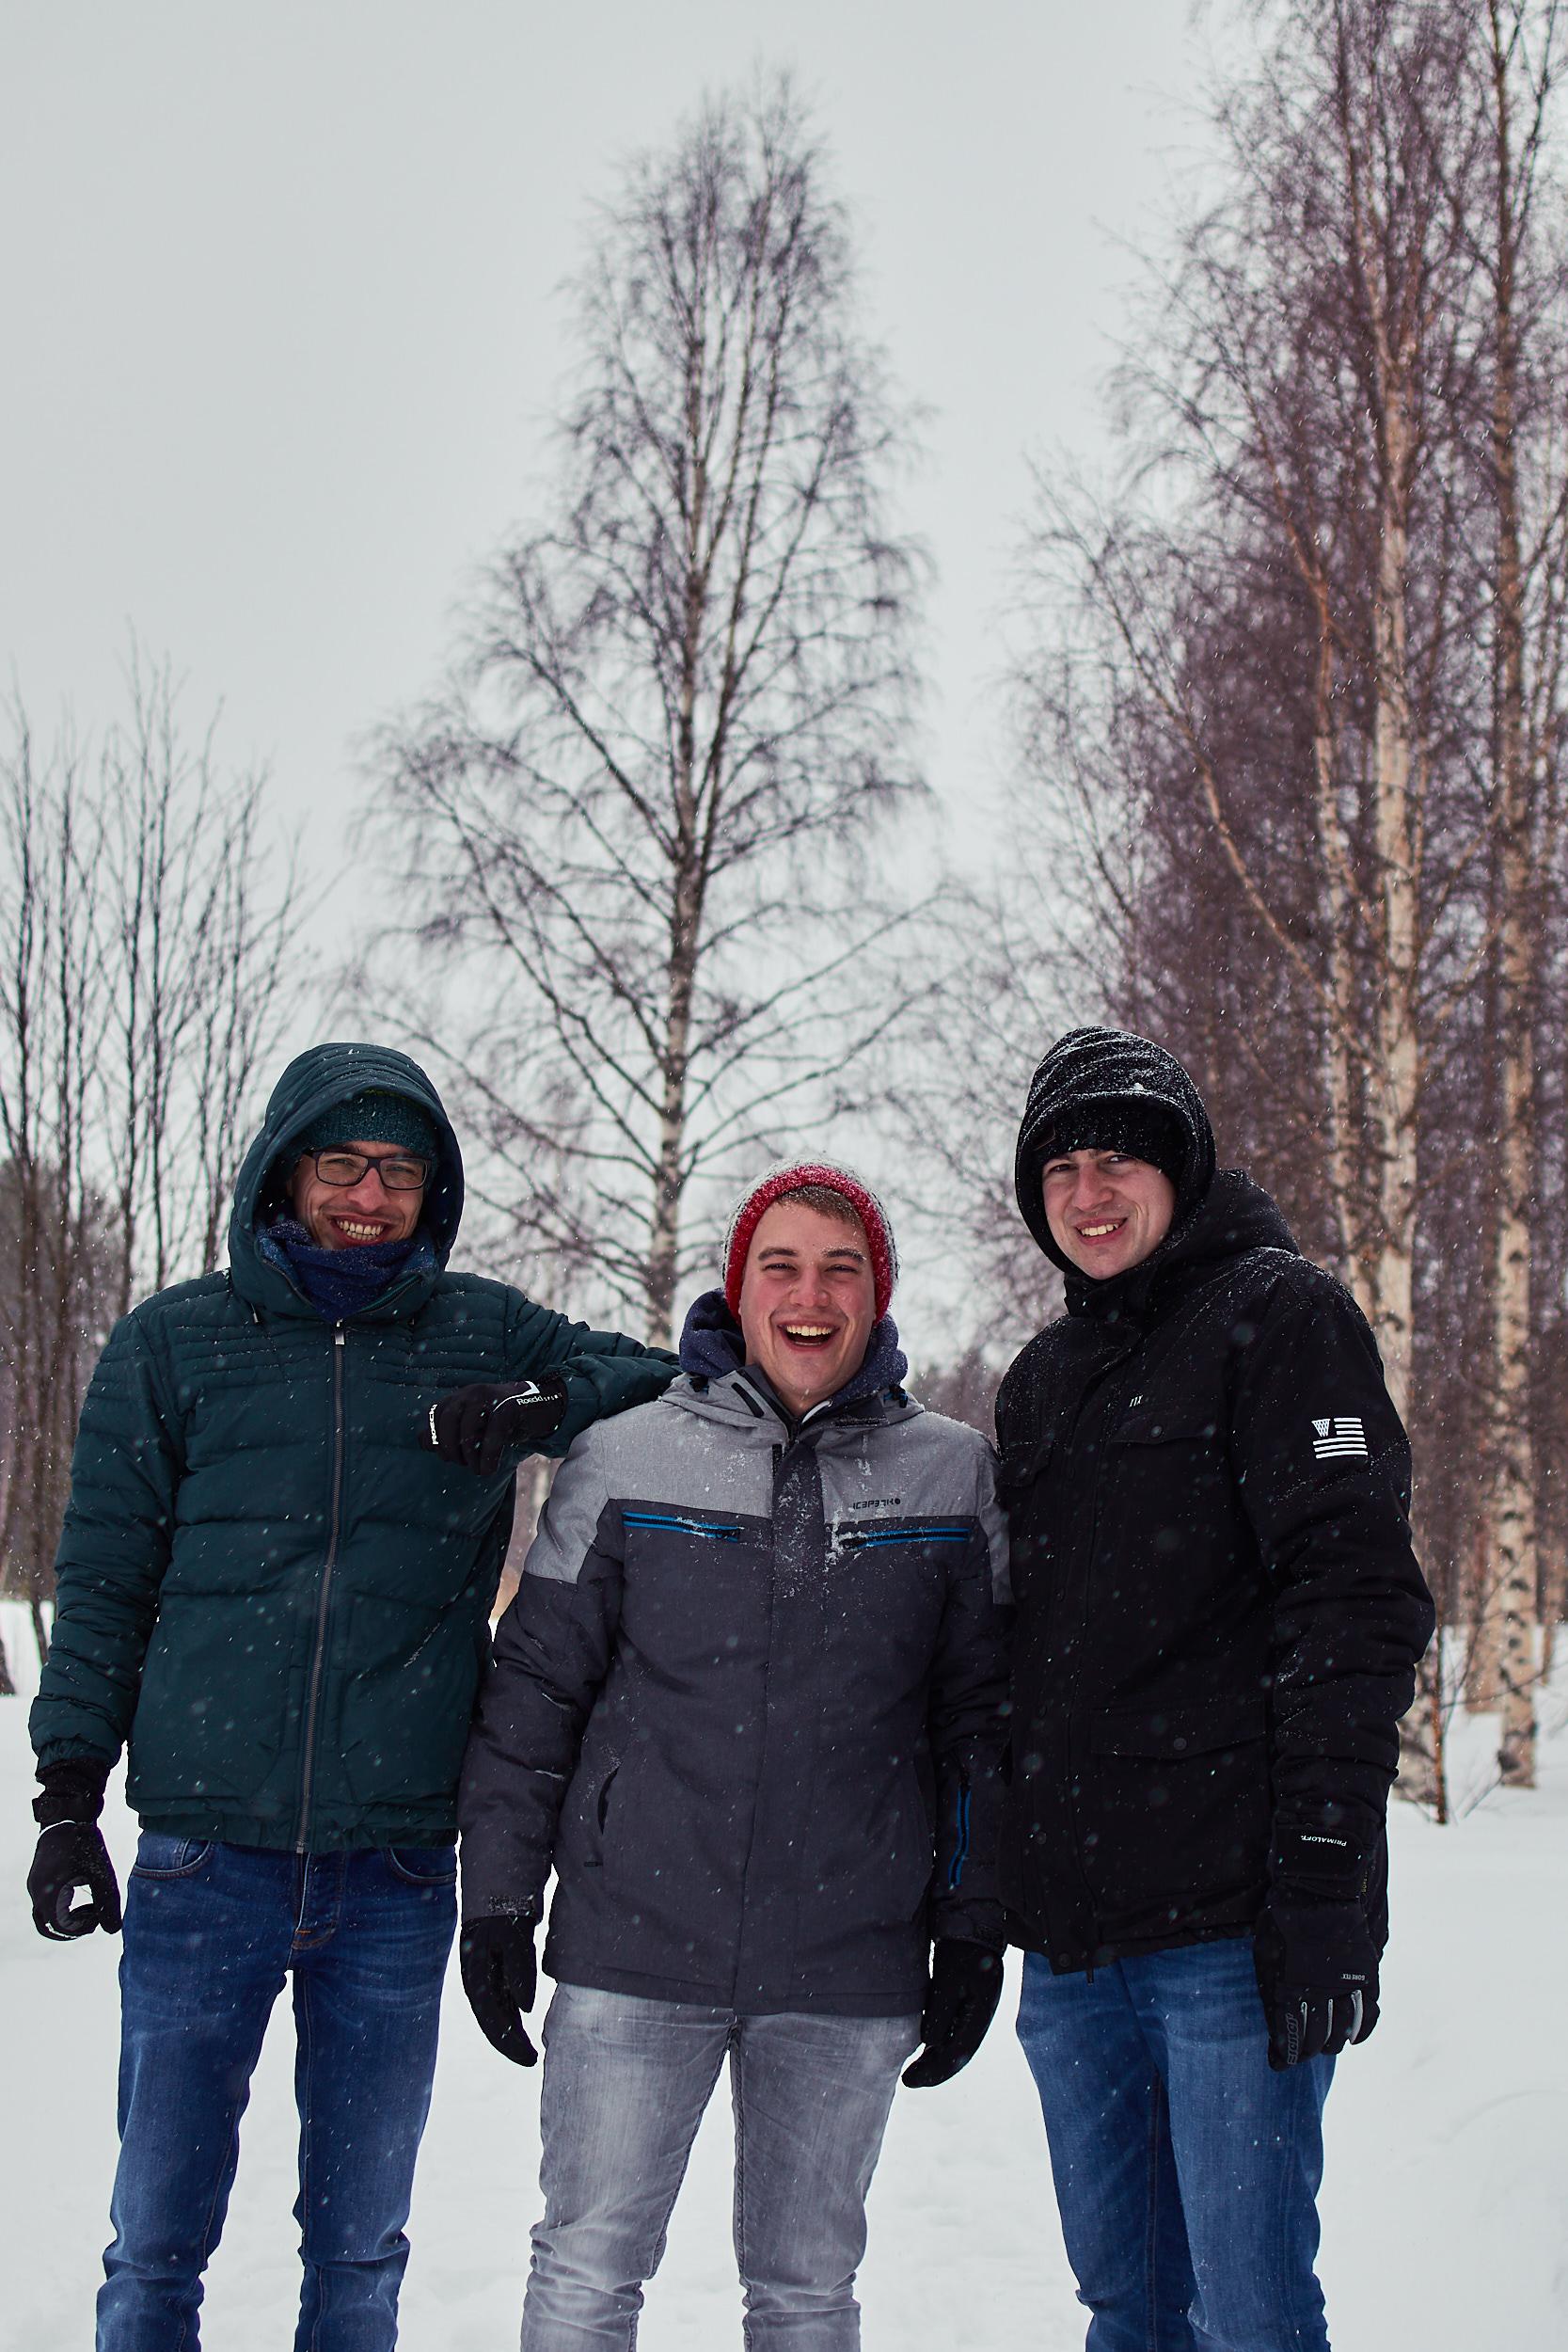 35 mm - 2019-03-08 12.03.33 - Oulu Marvin Timo.jpg